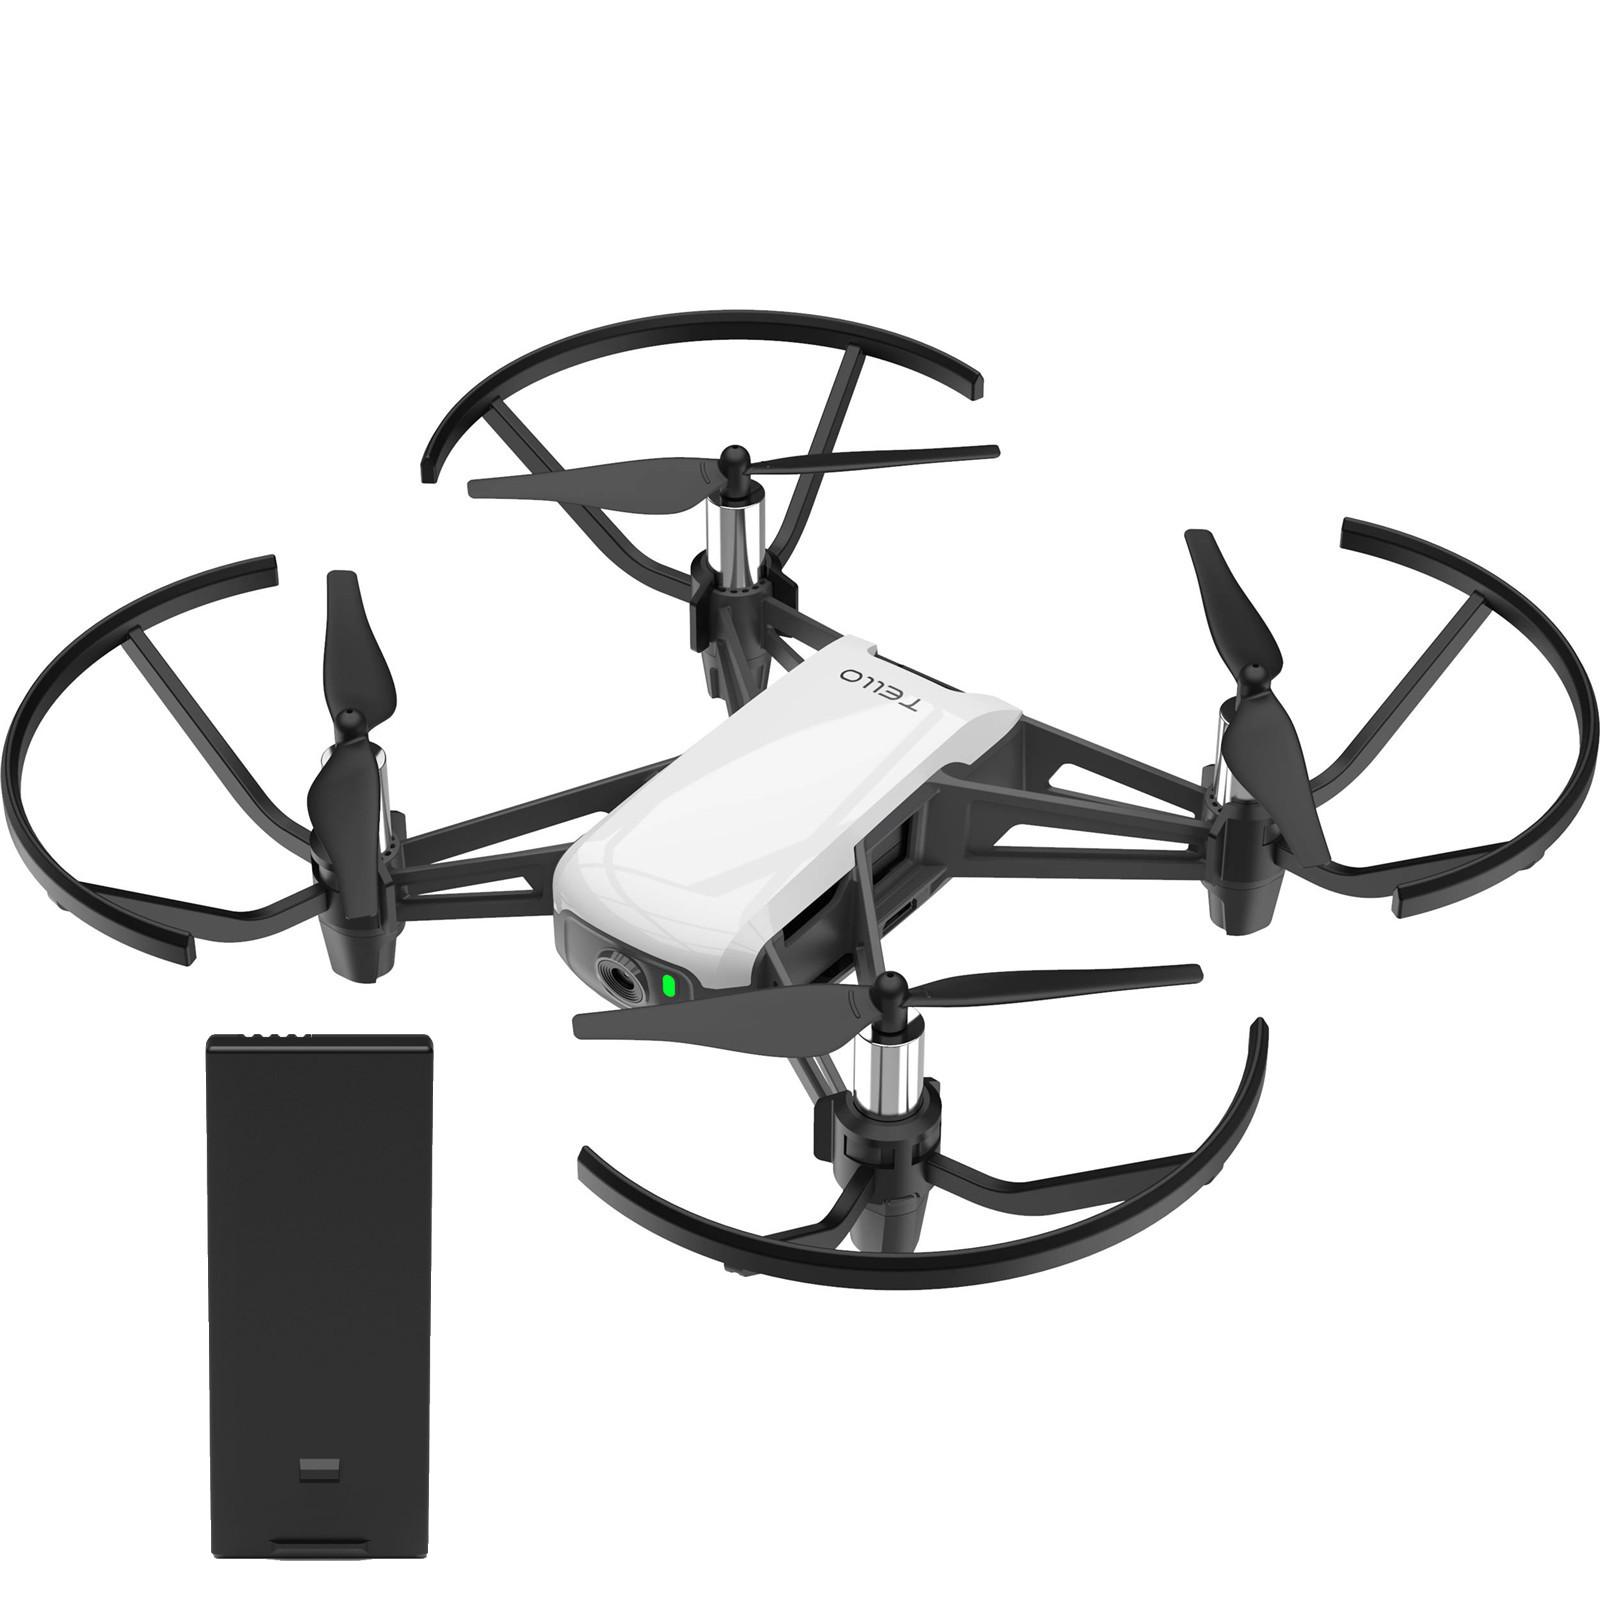 Buy the DJI Ryze Tello Drone With 720HD Video Camera, Powered by DJI  Flight    ( TOYDJI10001 ) online